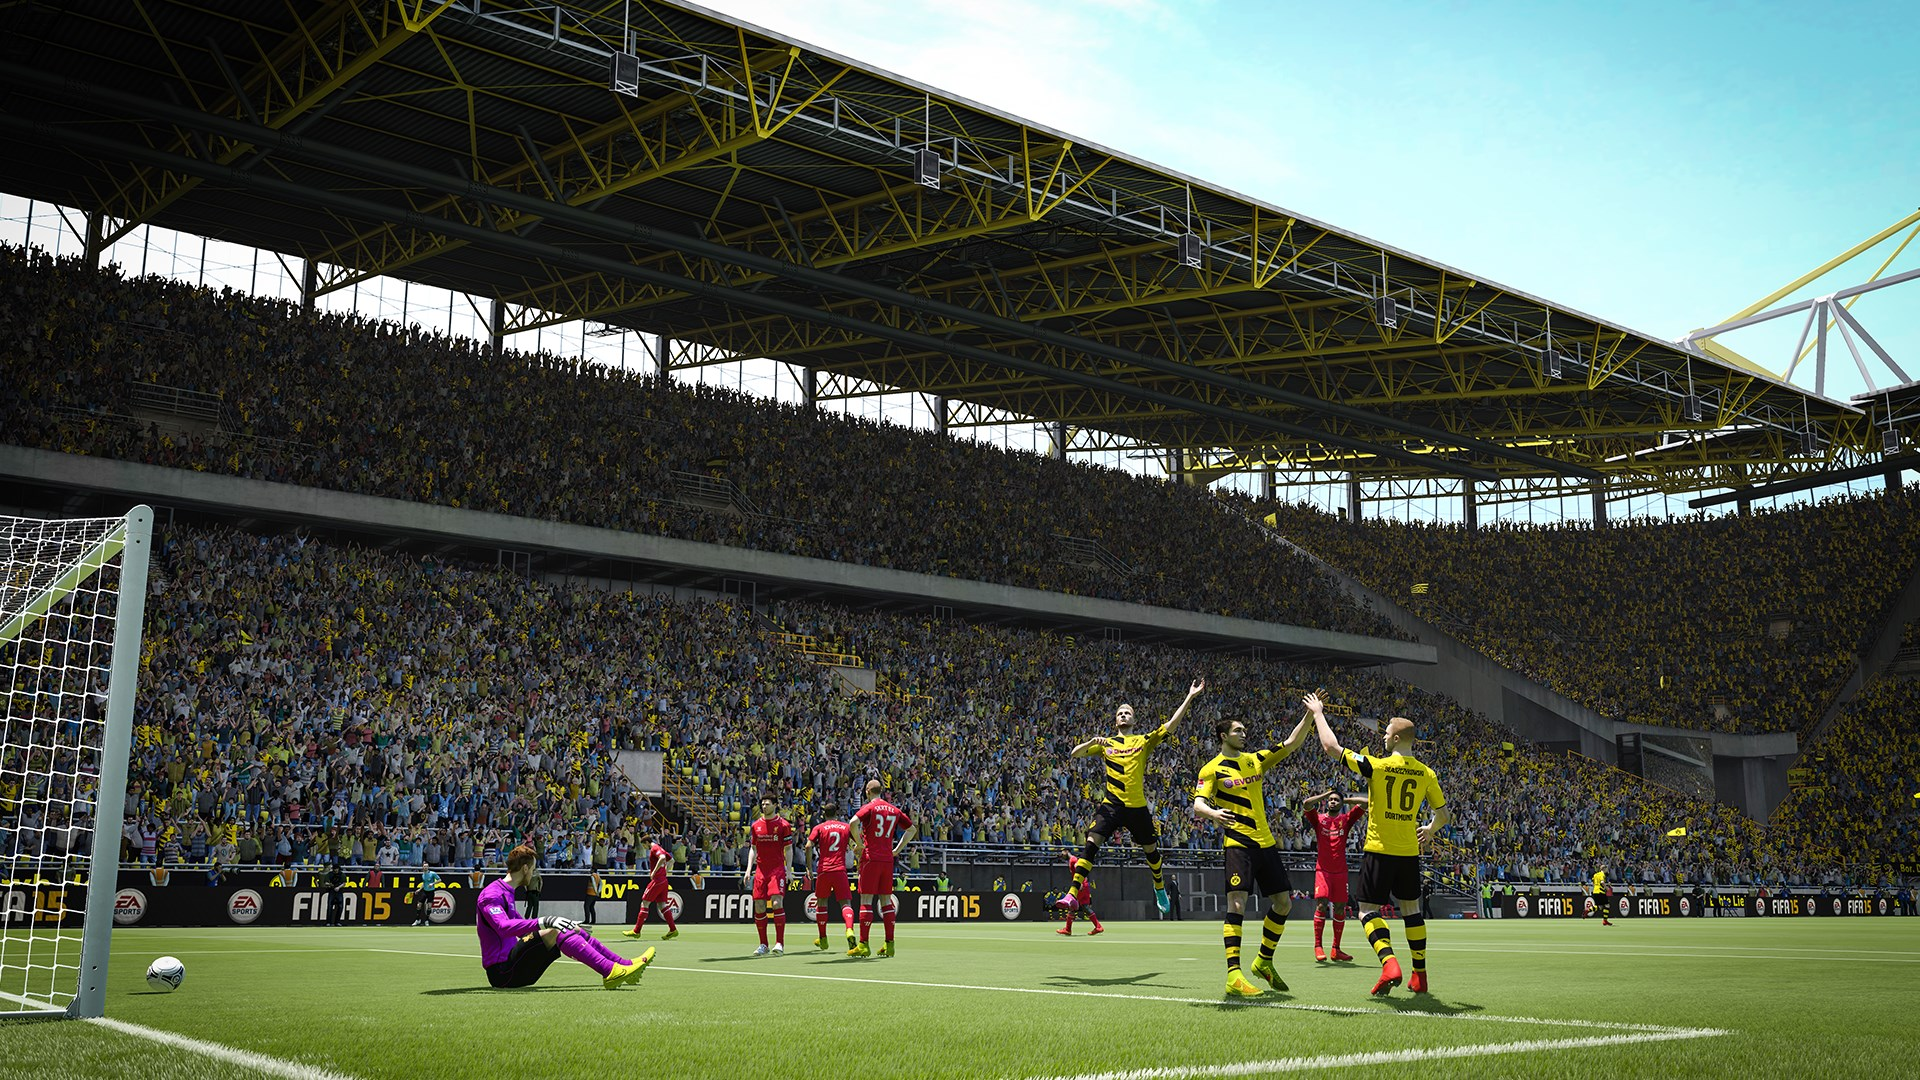 FIFA 15 DELUXE EDITION